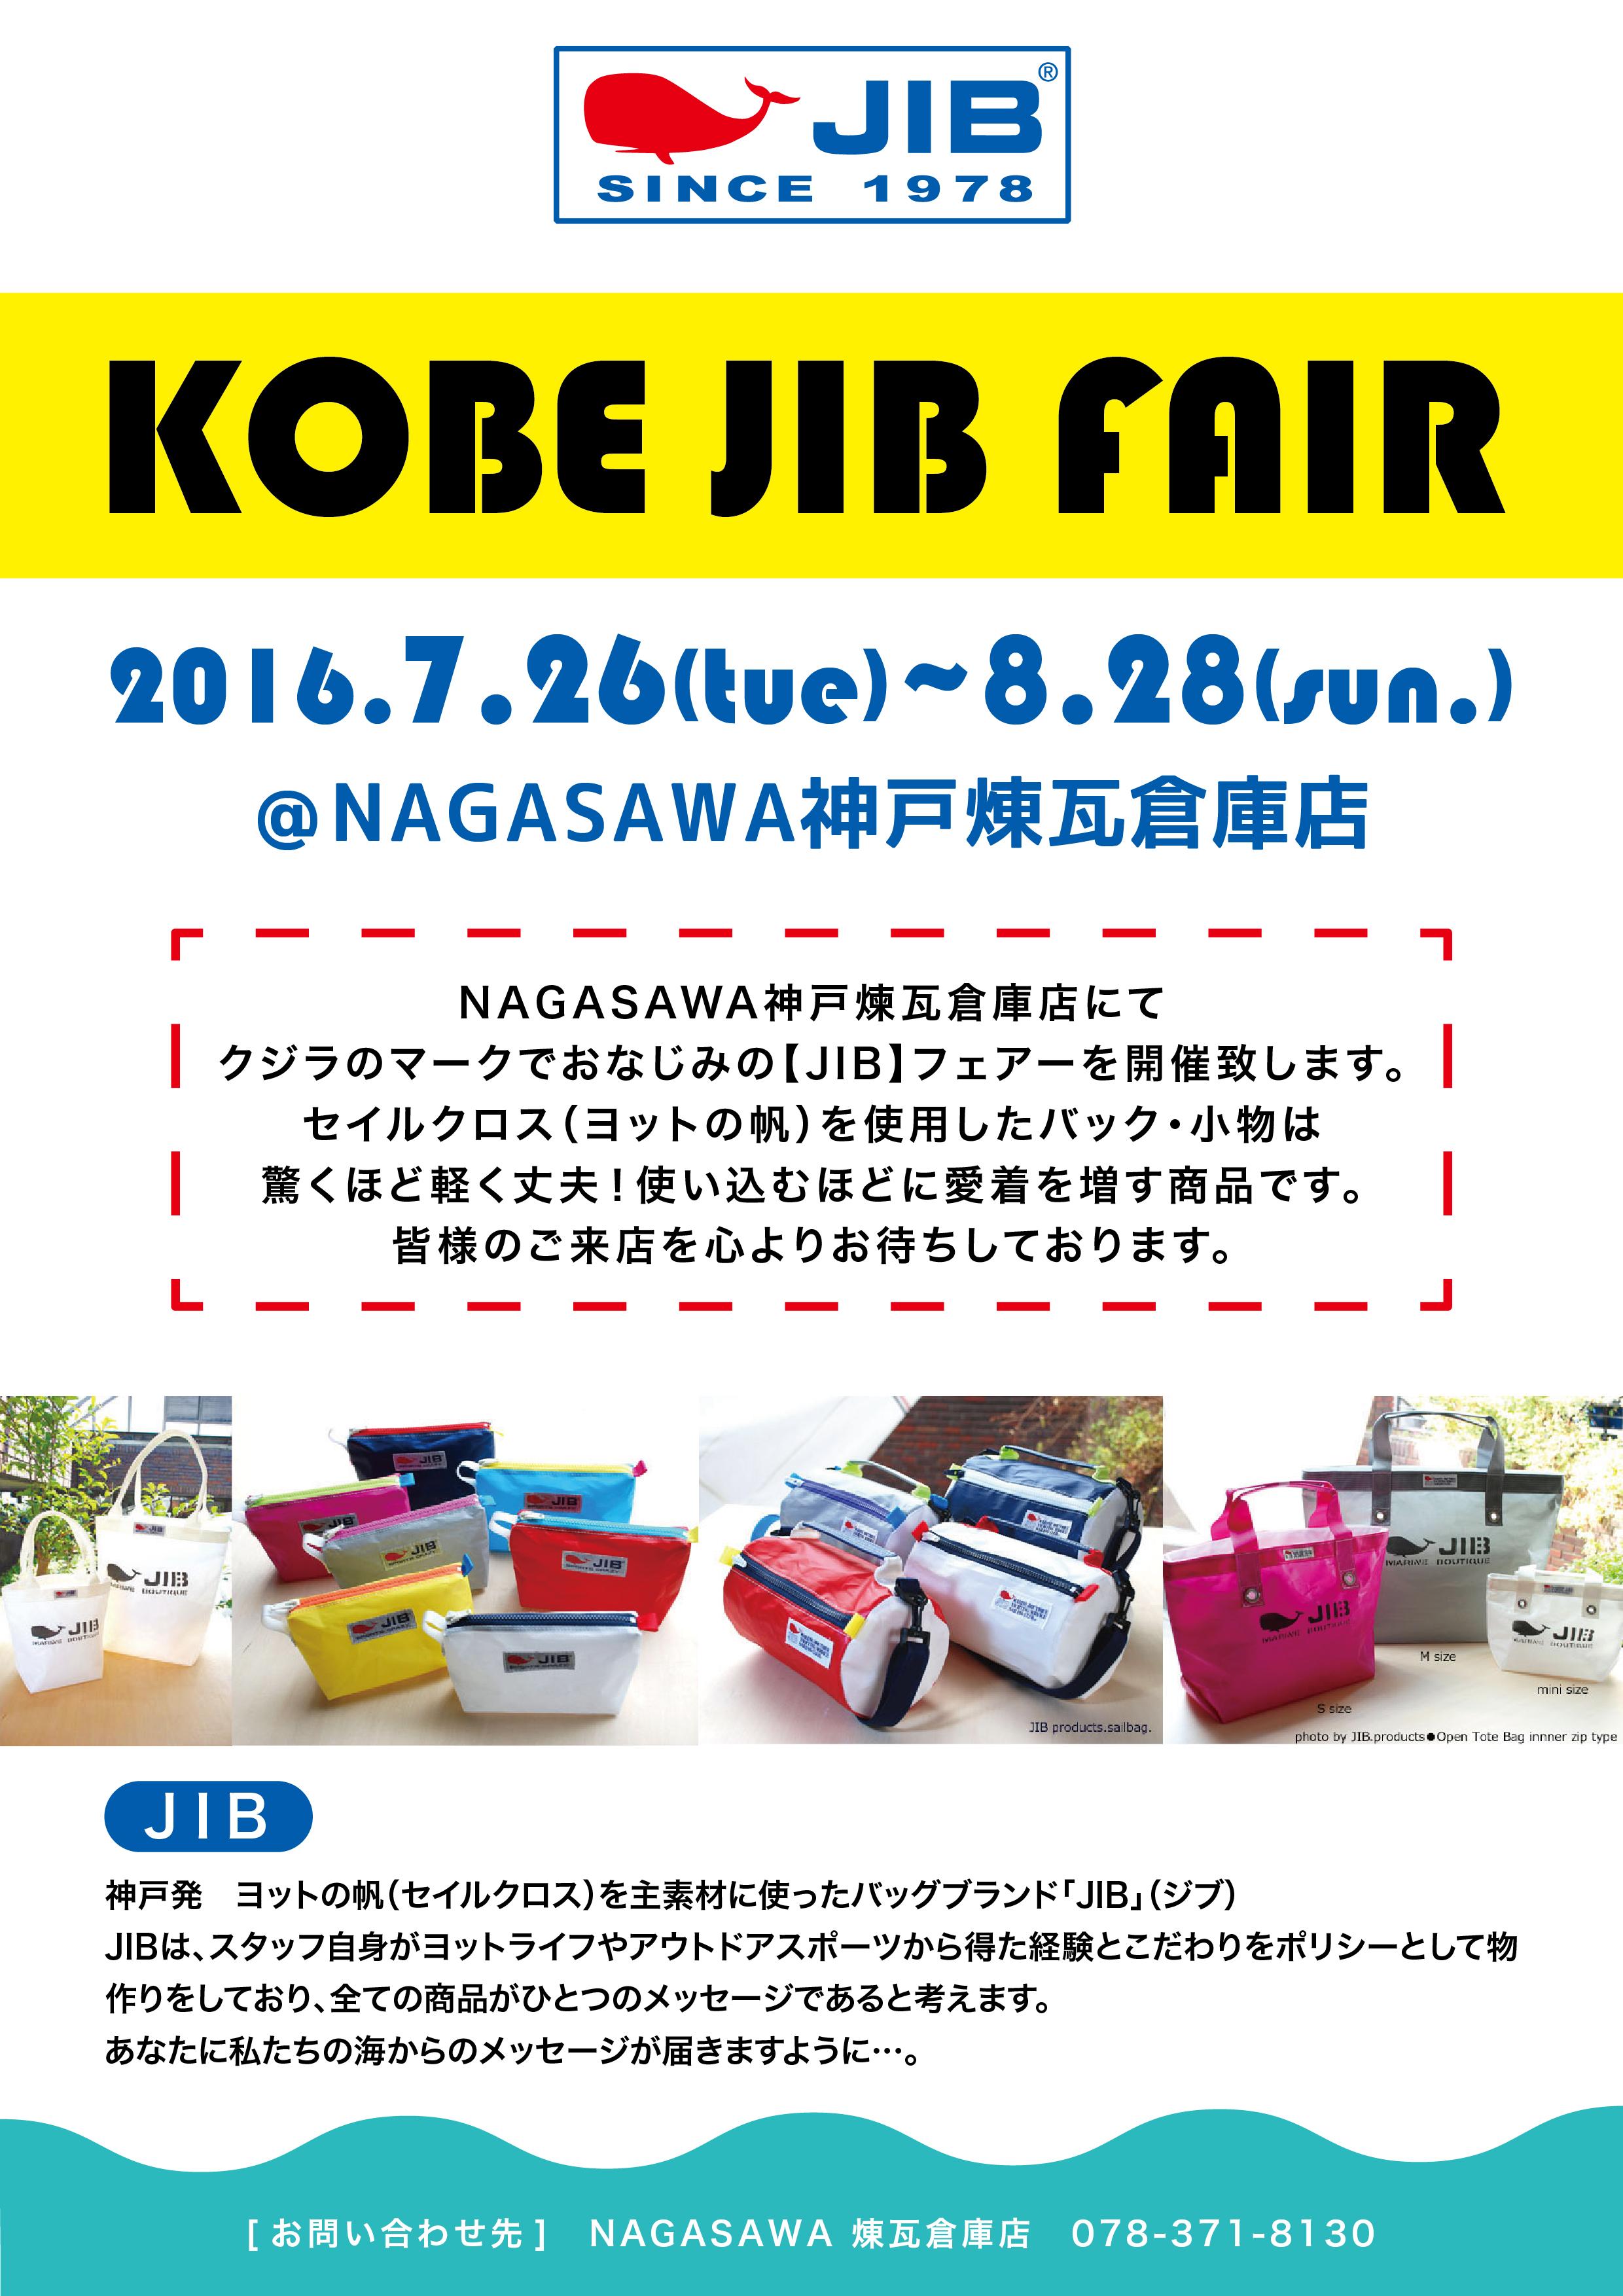 KOBE JIB FAIR  @NAGASAWA神戸煉瓦倉庫店